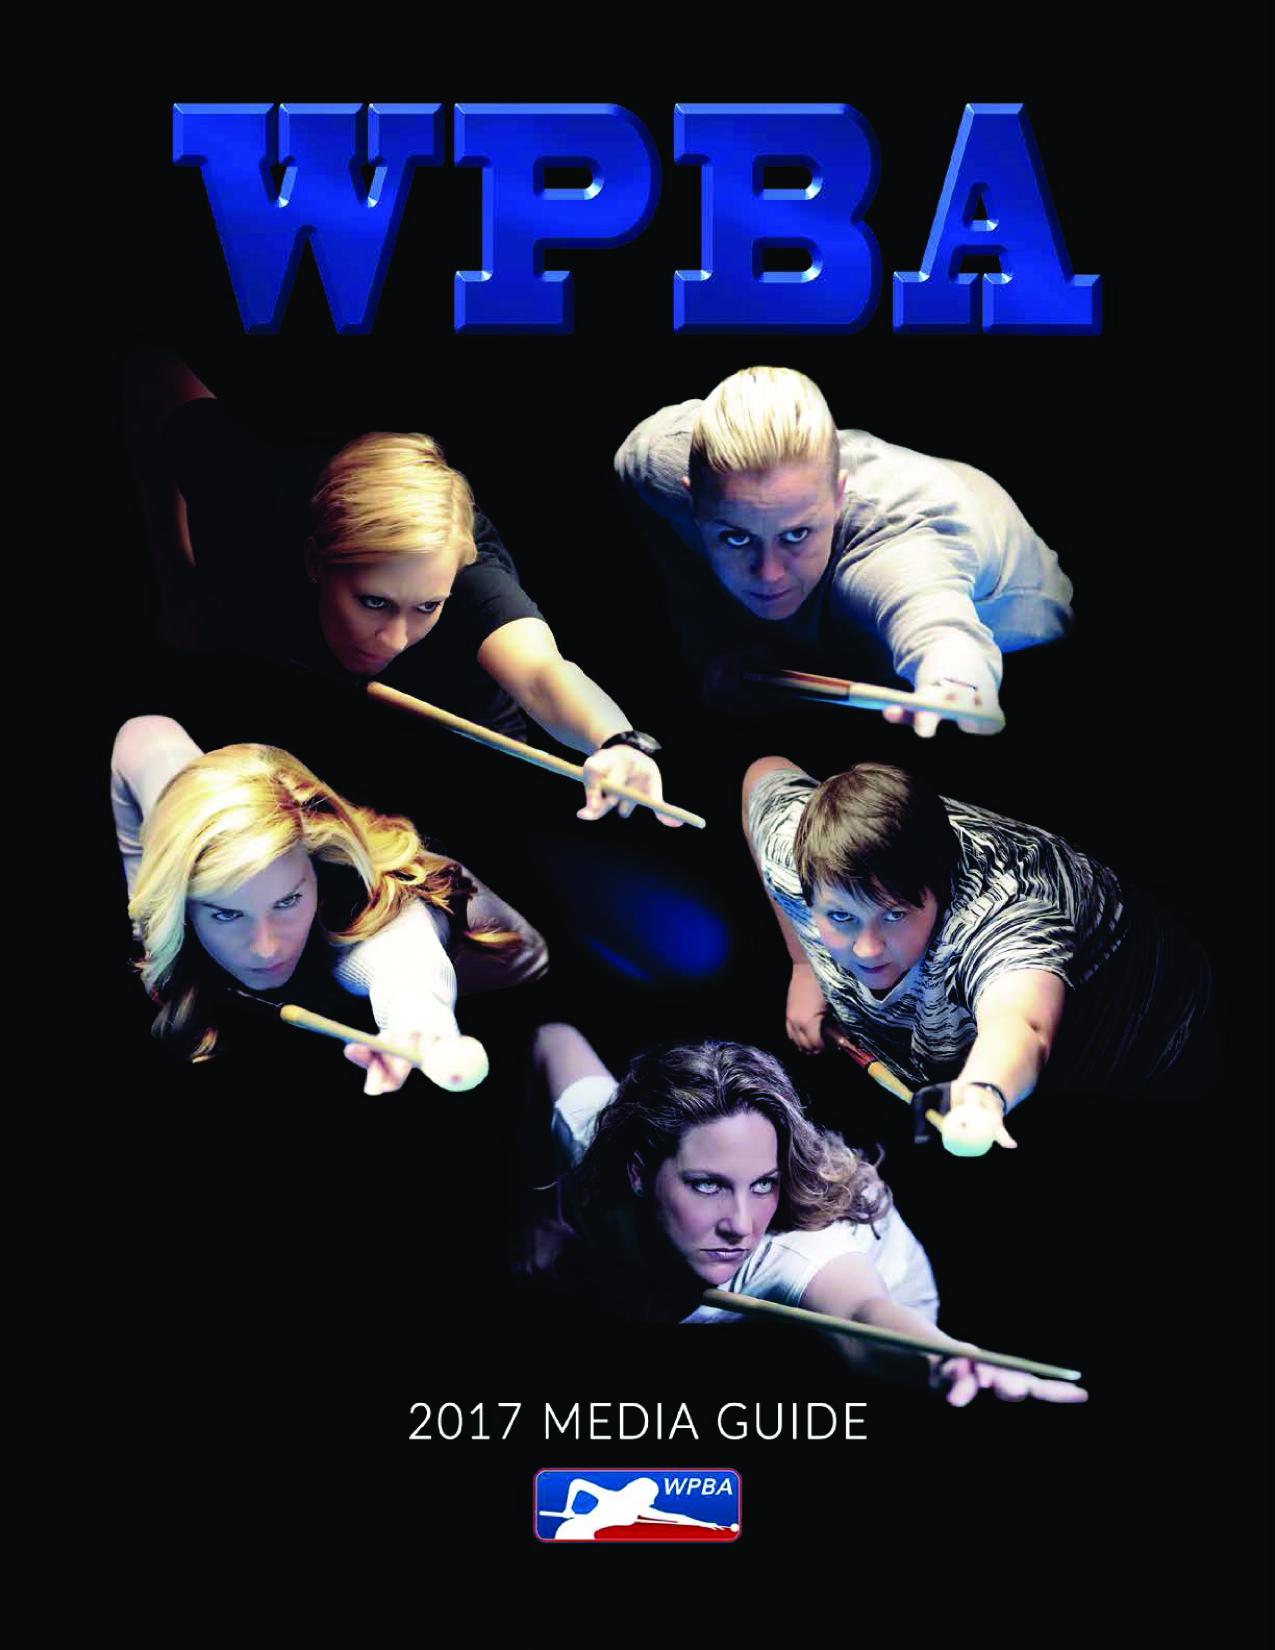 2017 WPBA Media Guide